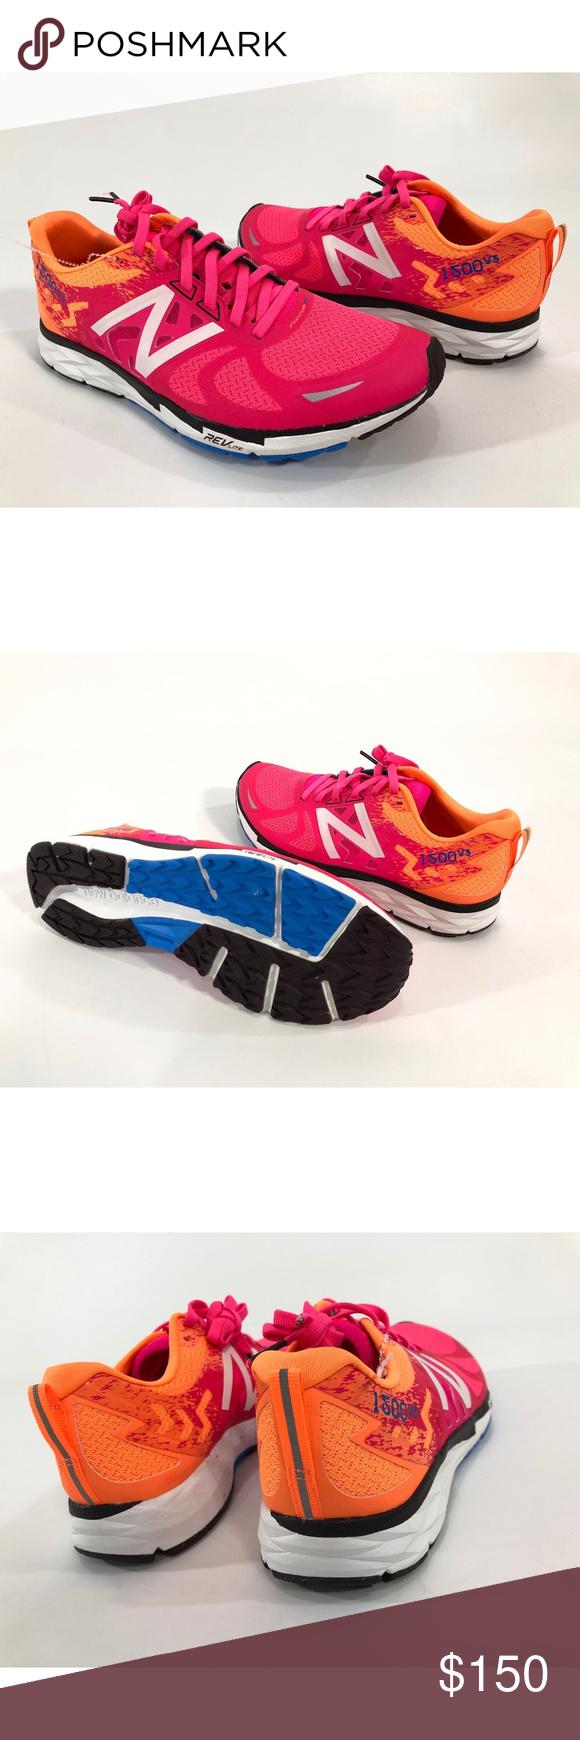 New Balance 1500 v3 Womens Running Training Shoes New Balance ...